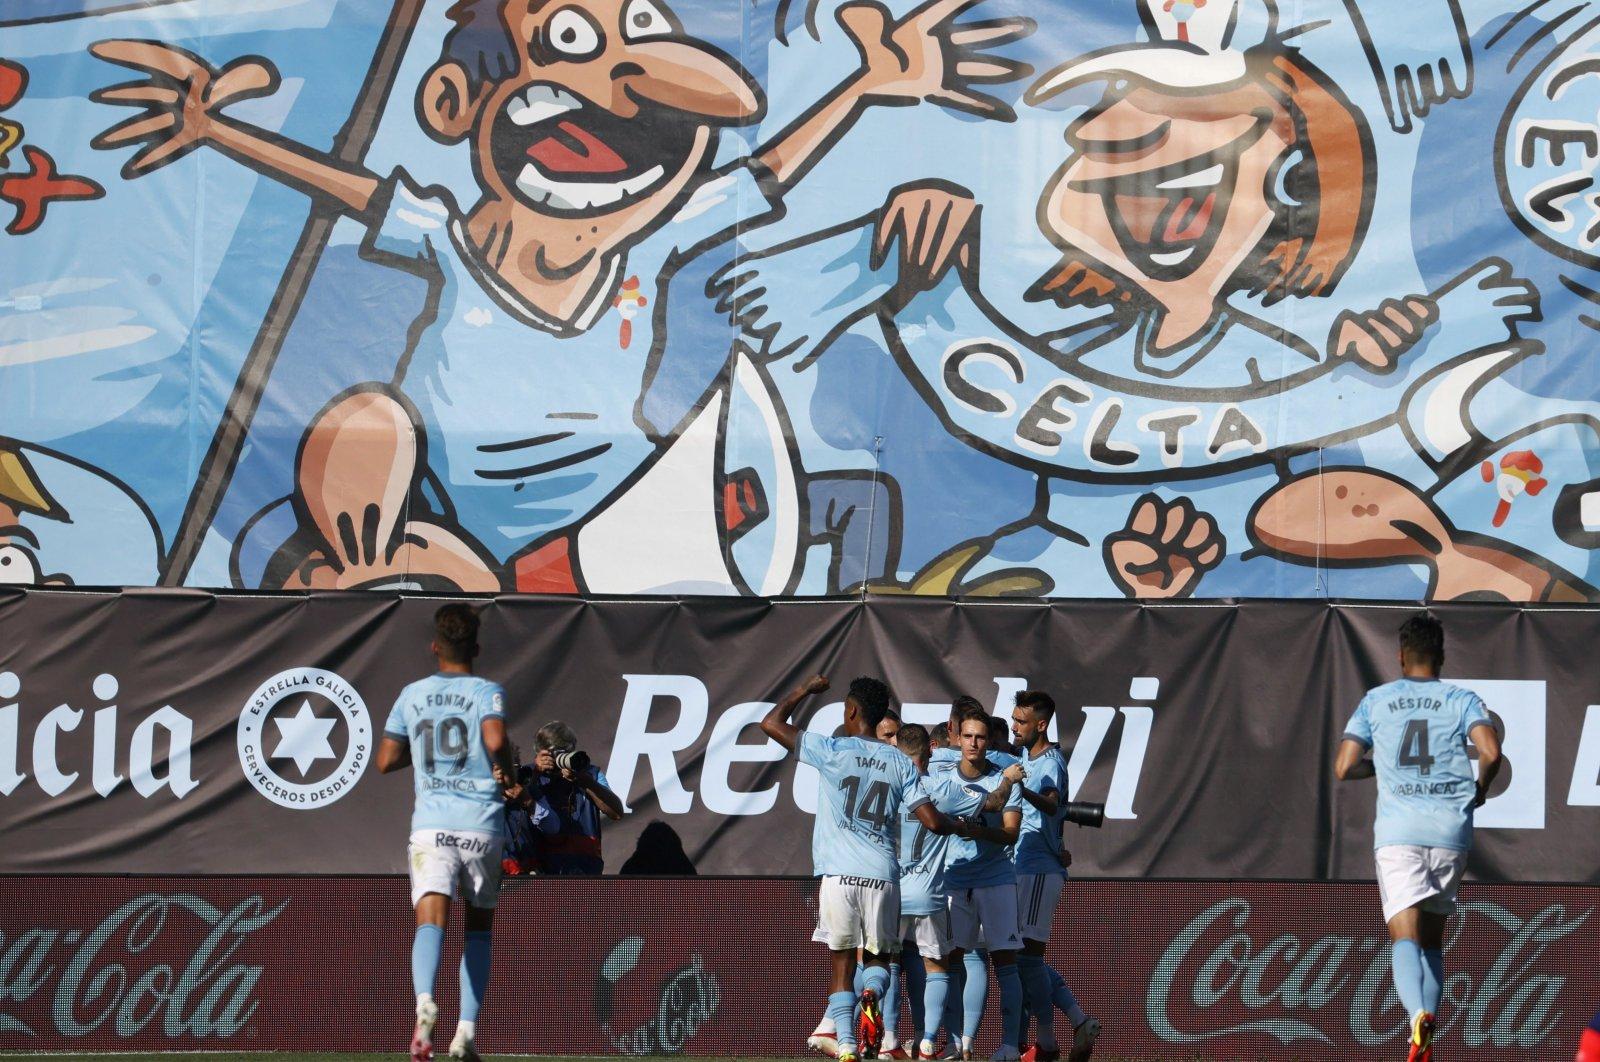 Celta de Vigo's players celebrate after scoring the 1-1 goal during a Spanish LaLiga soccer match between Celta de Vigo and Atletico Madrid at Balaidos stadium in Vigo, Galicia, Spain, Aug. 15, 2021. (EPA Photo)